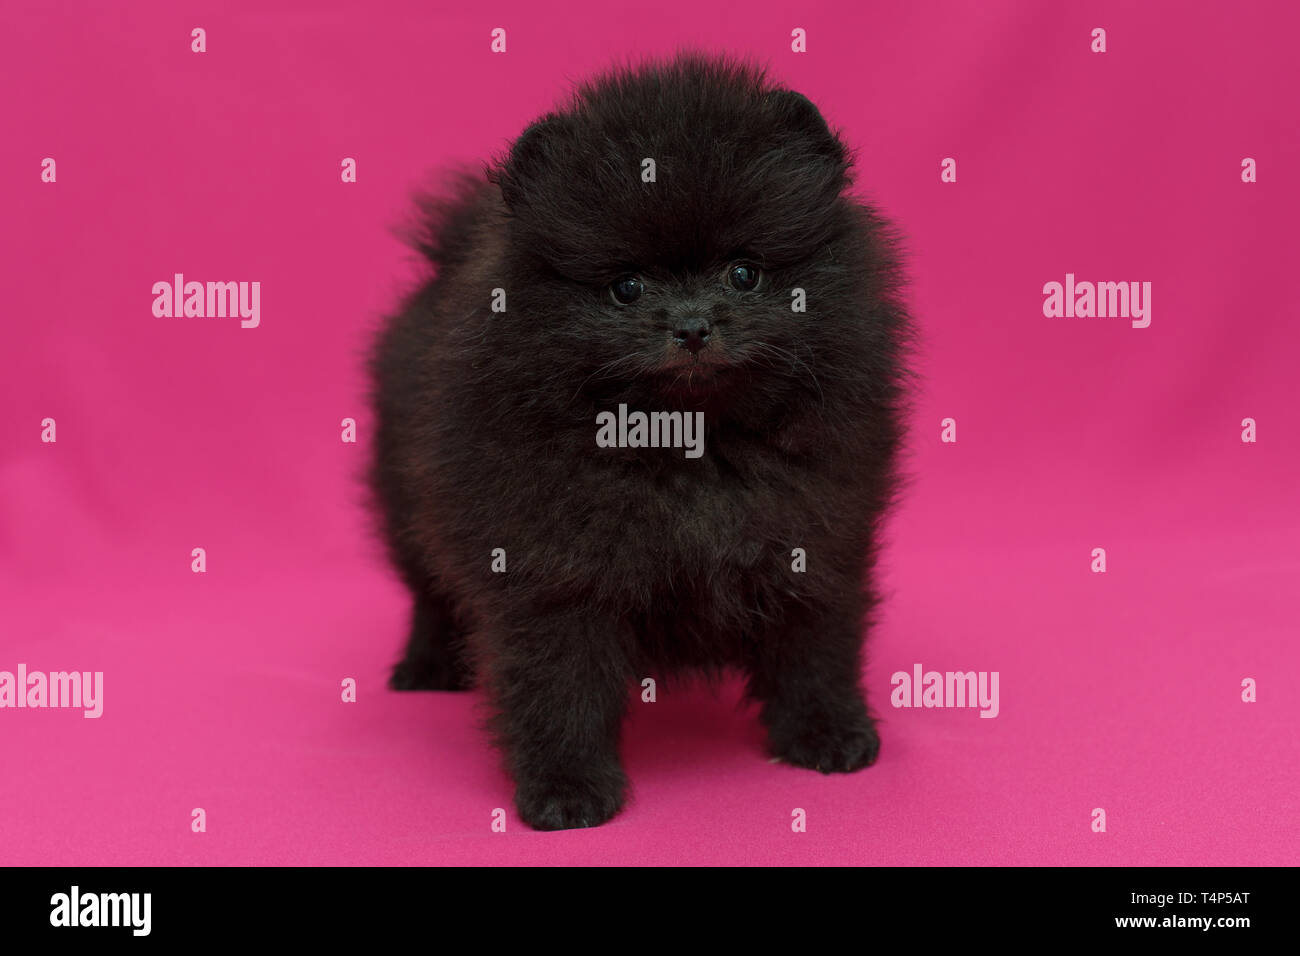 Small Black Pomeranian Puppy On Red Background Stock Photo Alamy